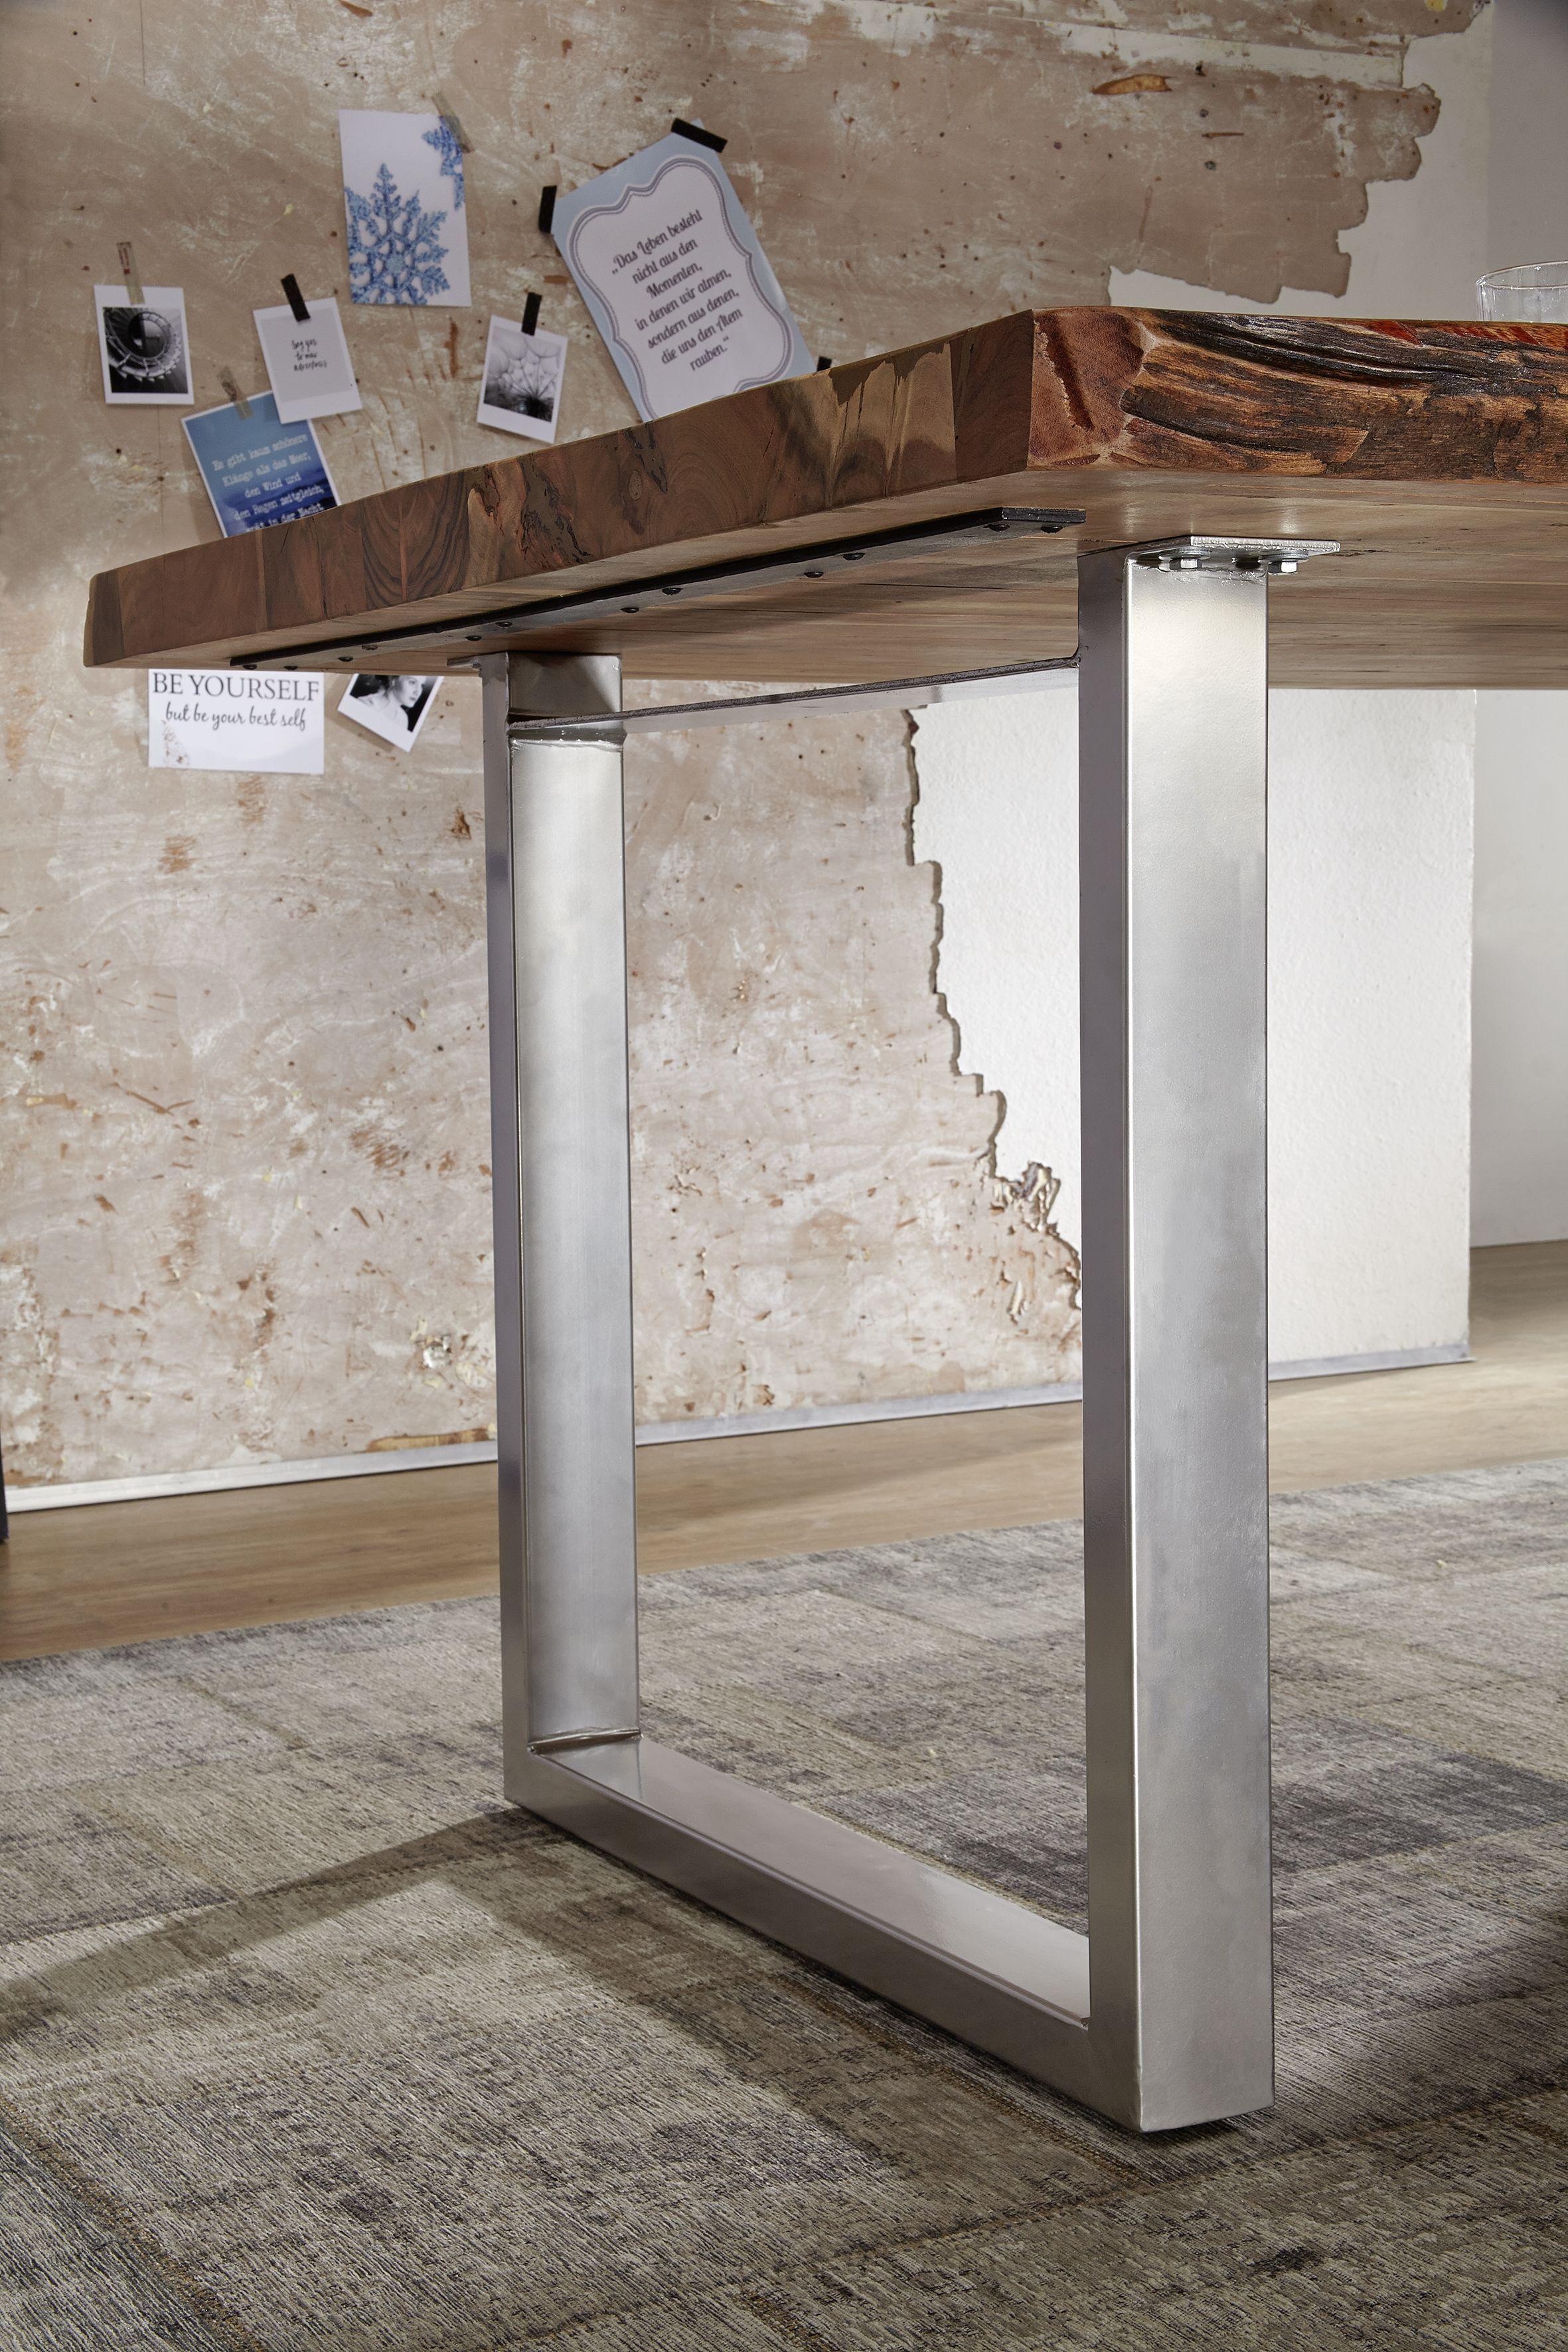 Baumstamm Möbel Aus Massivholz Möbel Serie Freeform